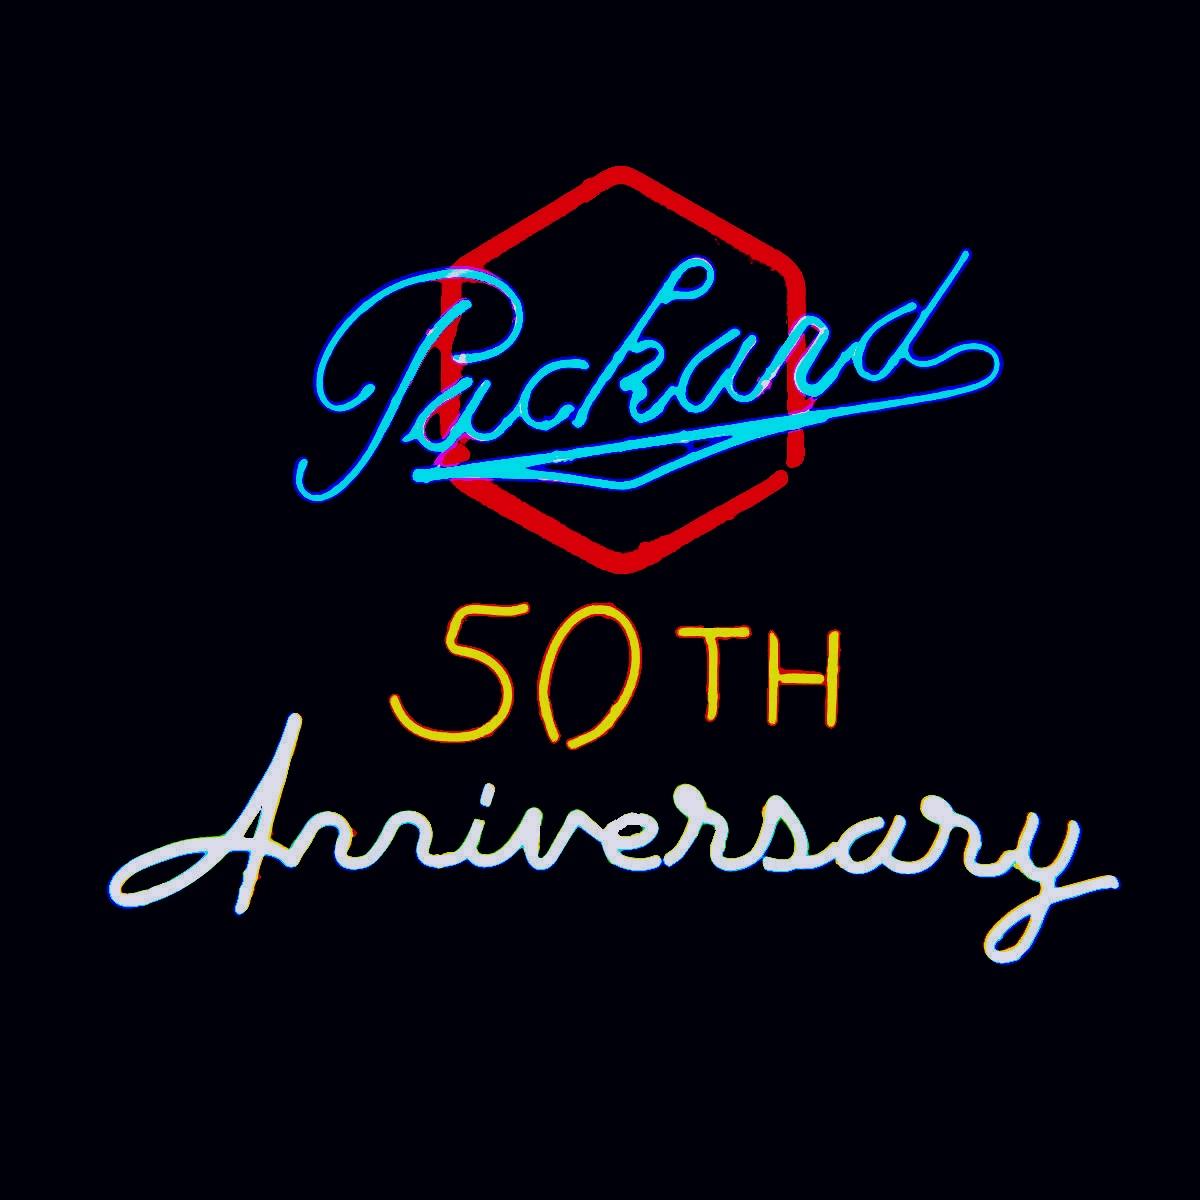 Packard Golden Anniversary Neon Sign by John Barton - BartonNeonMagic.com